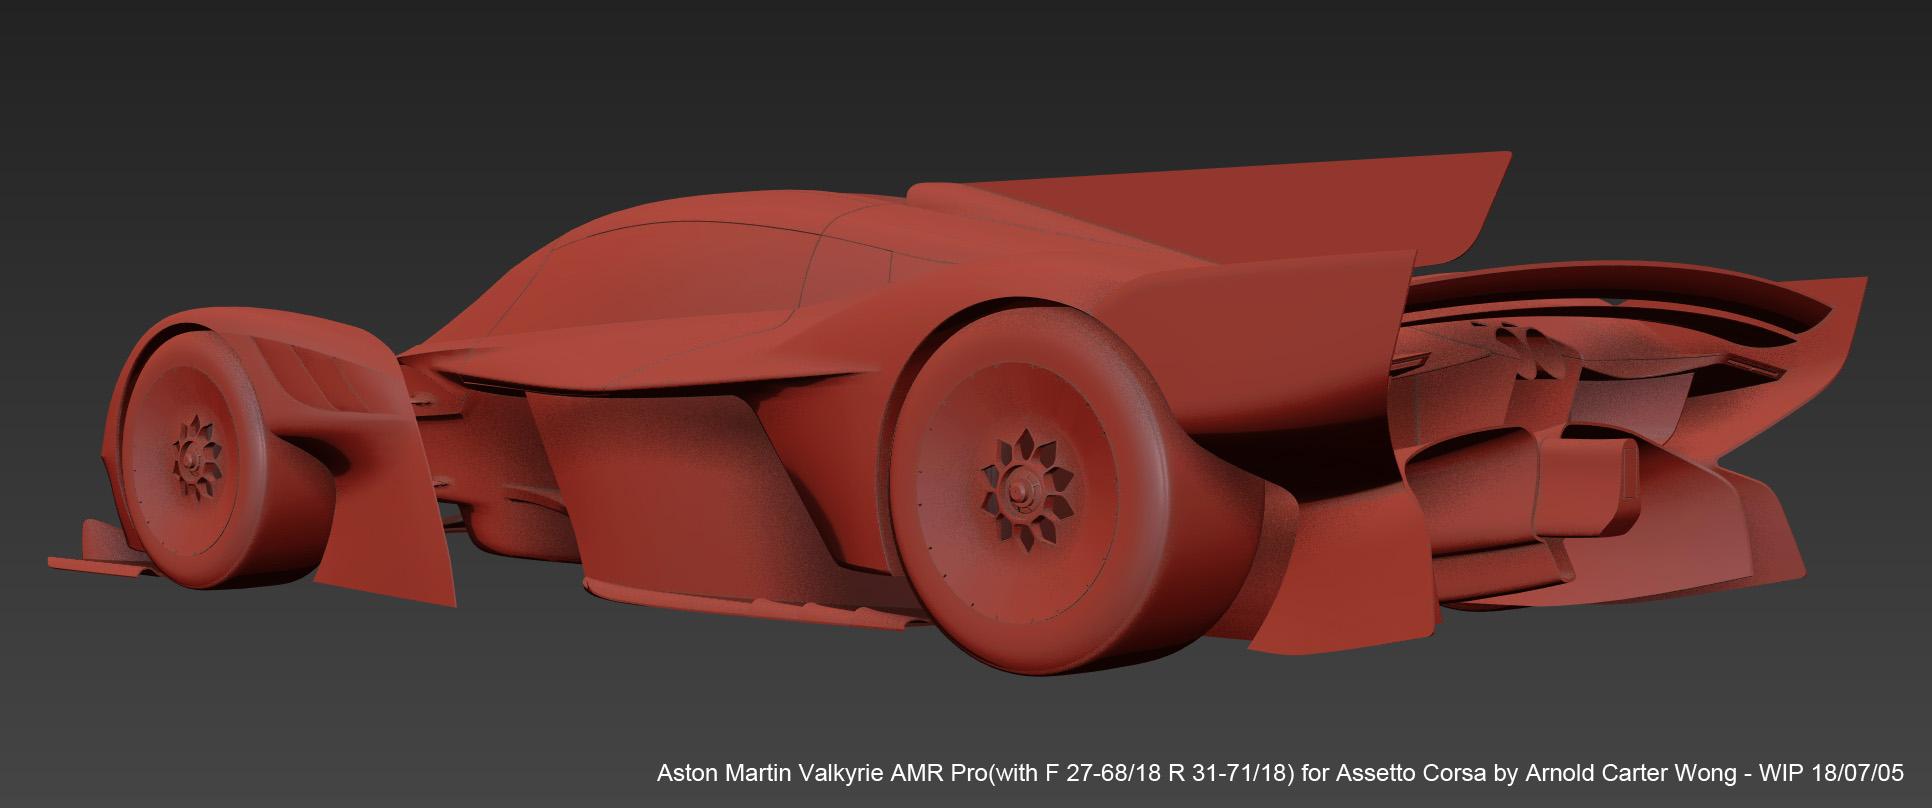 Cars Aston Martin Valkyrie Amr Pro Racedepartment